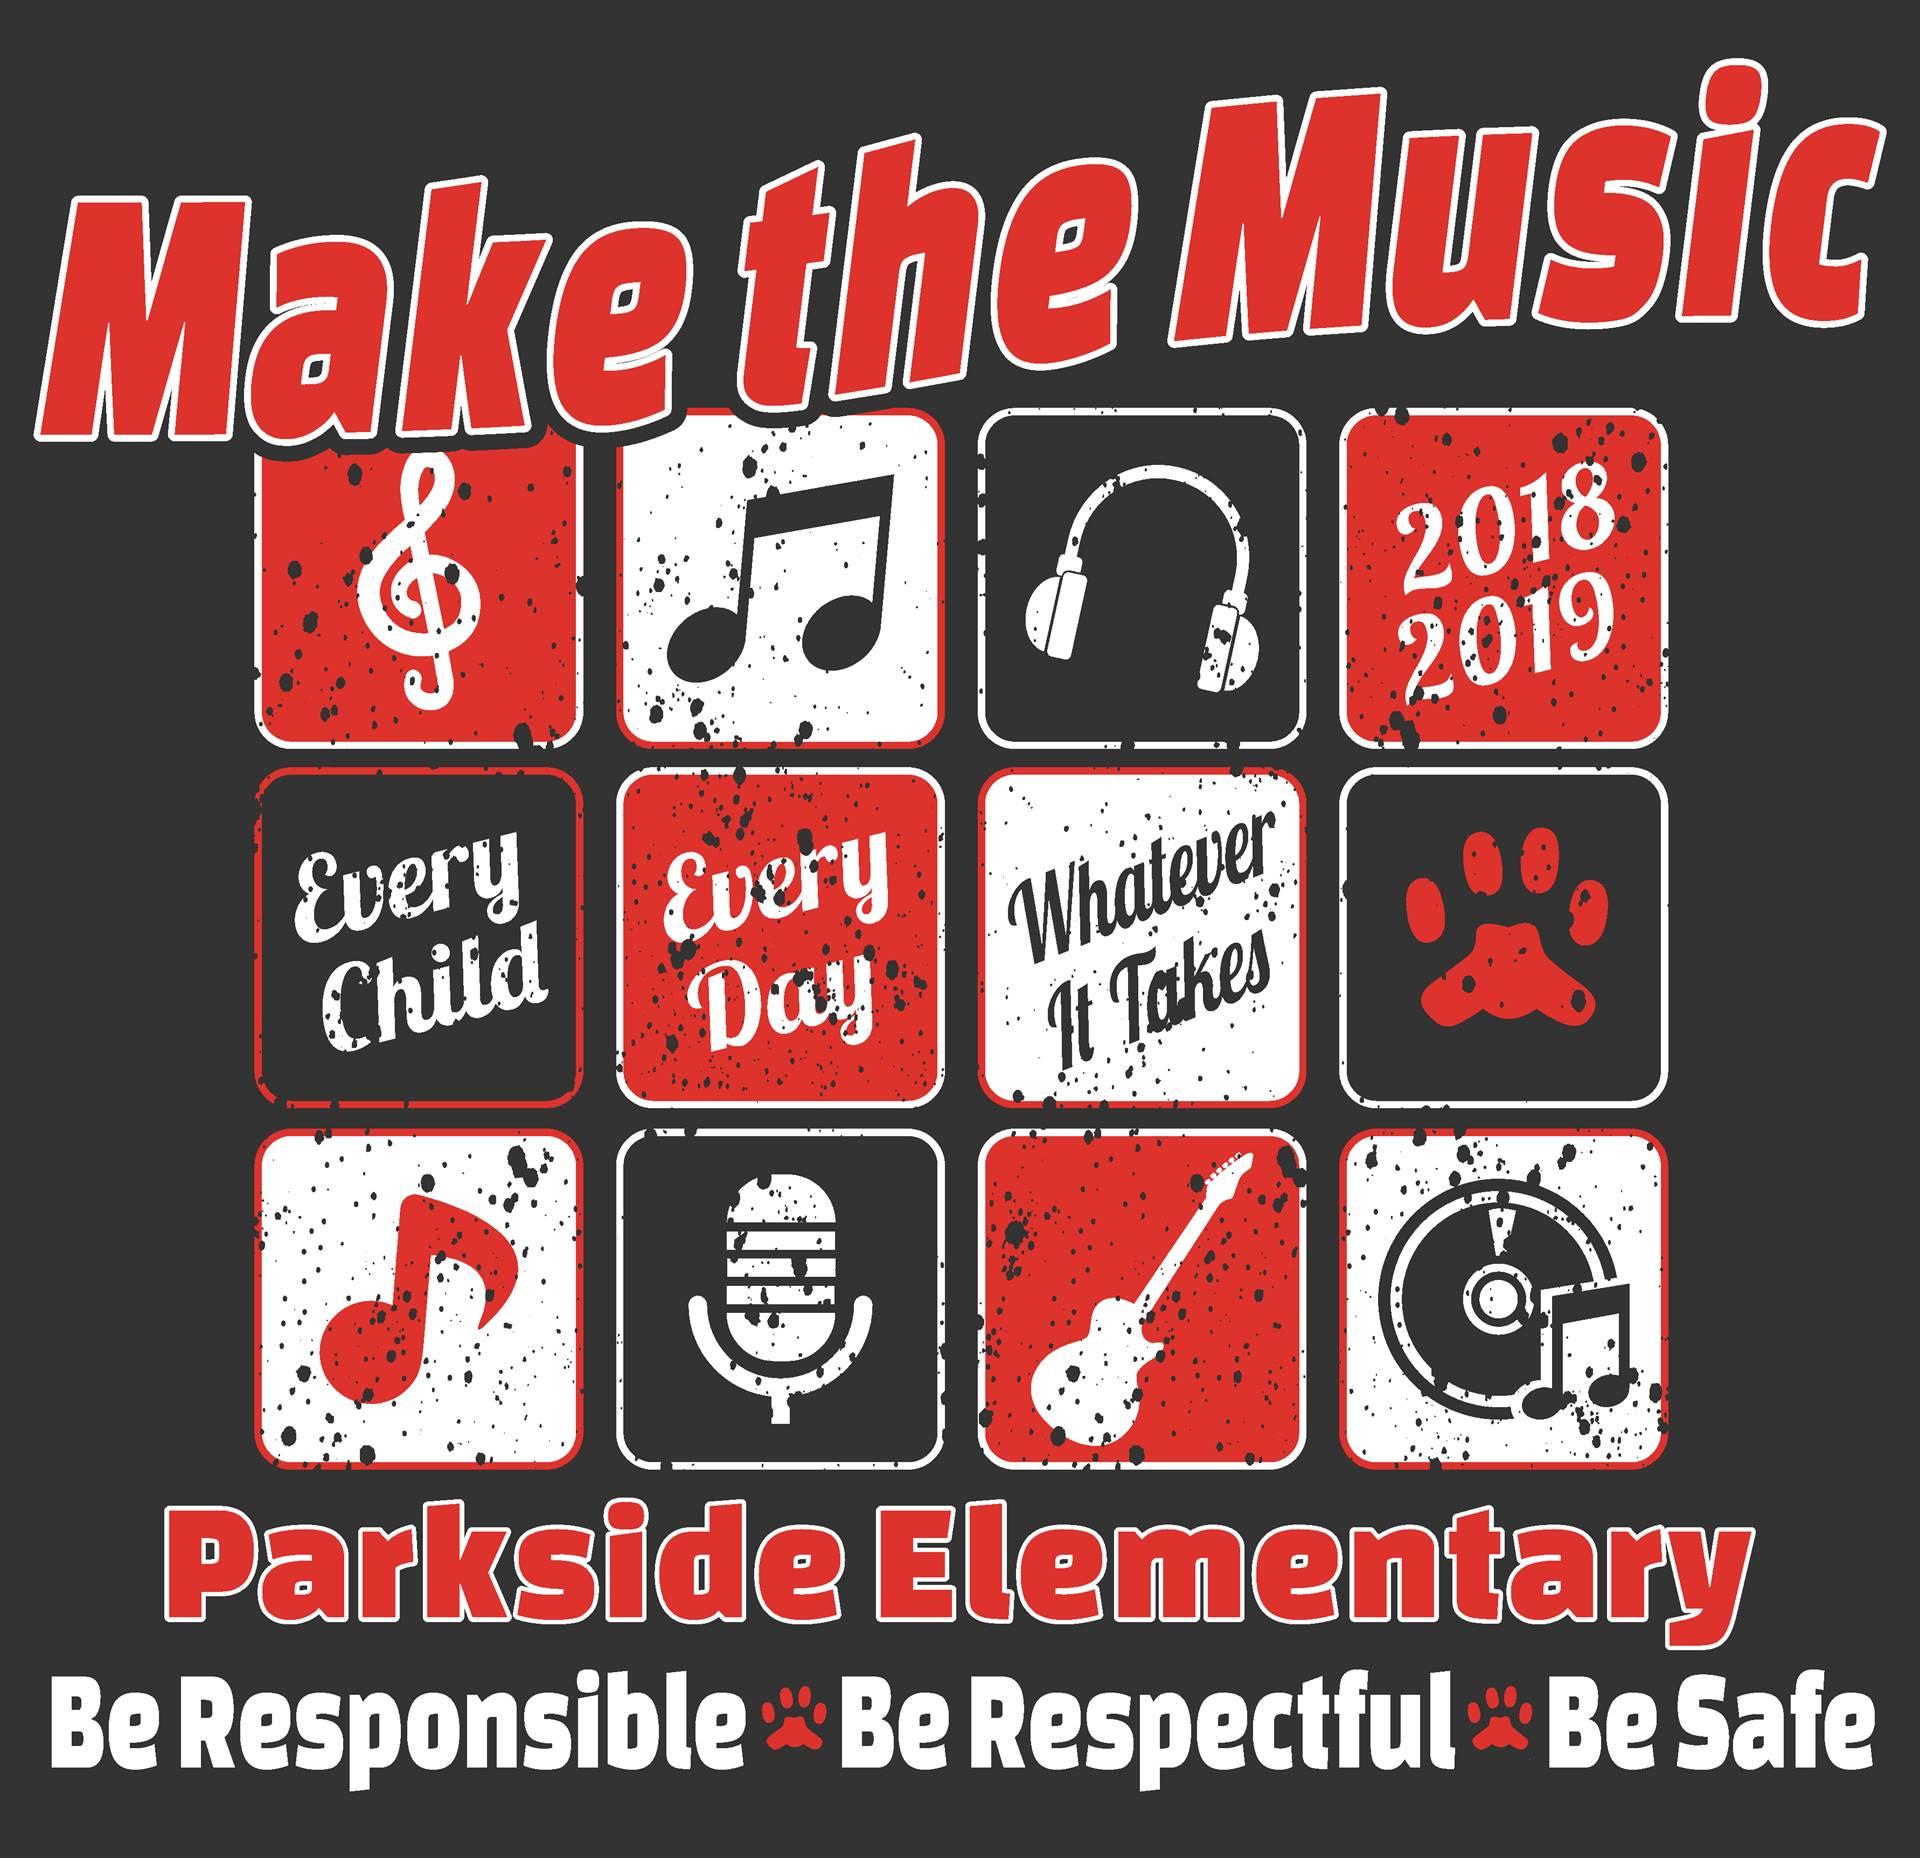 Make the Music Logo